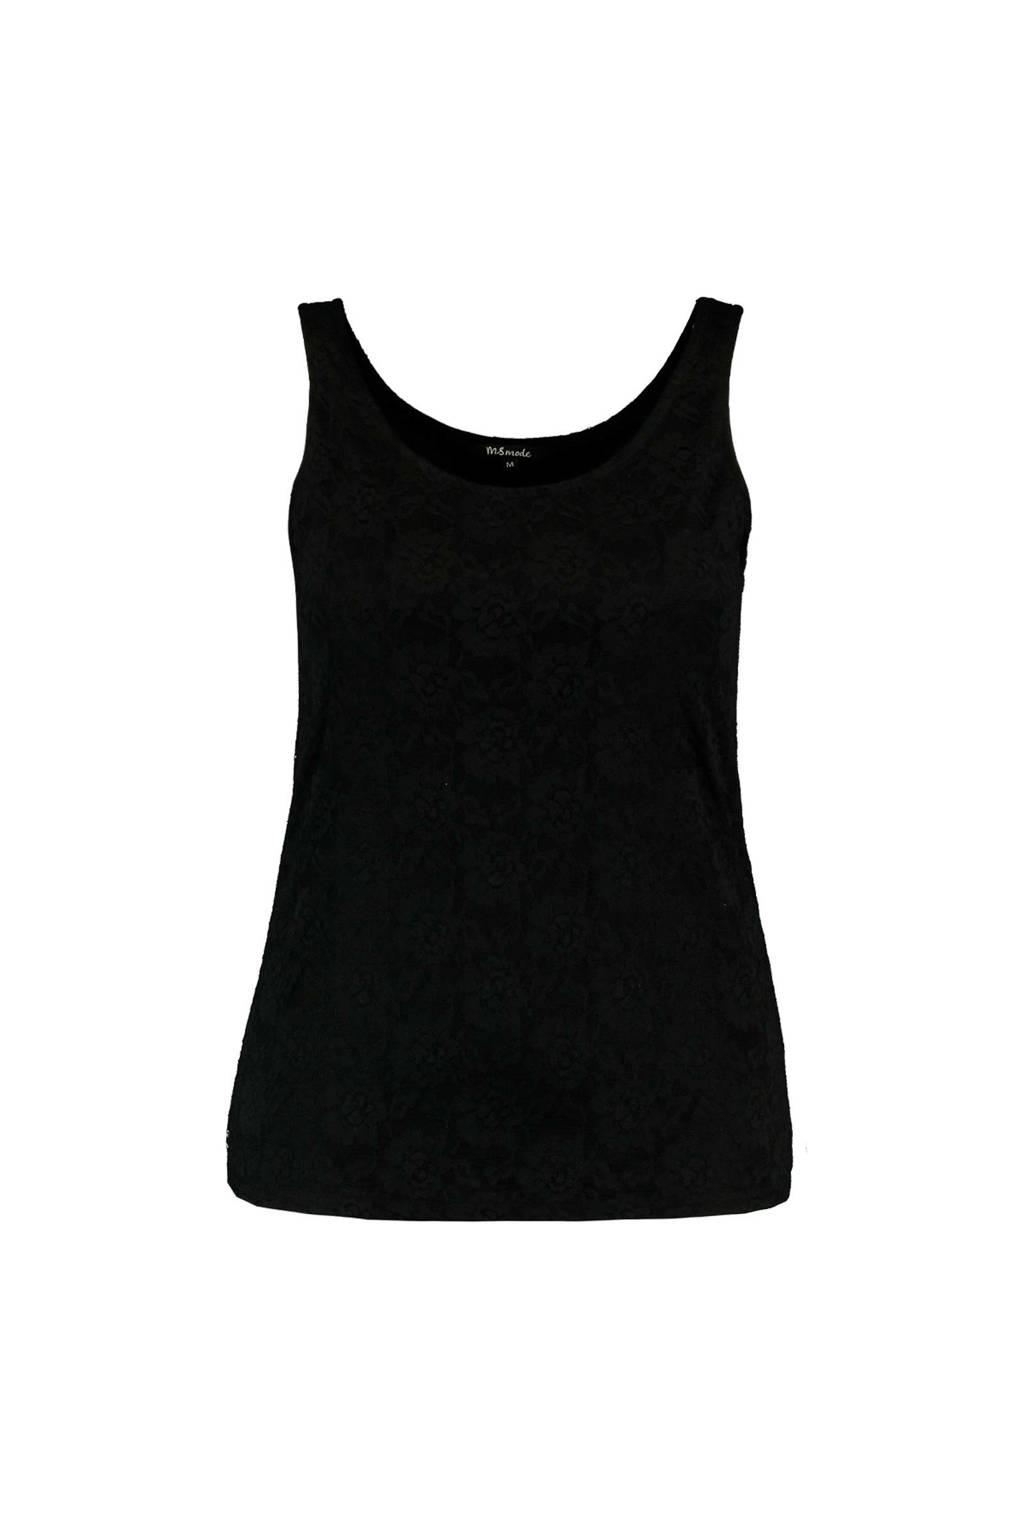 MS Mode kanten singlet zwart, Zwart